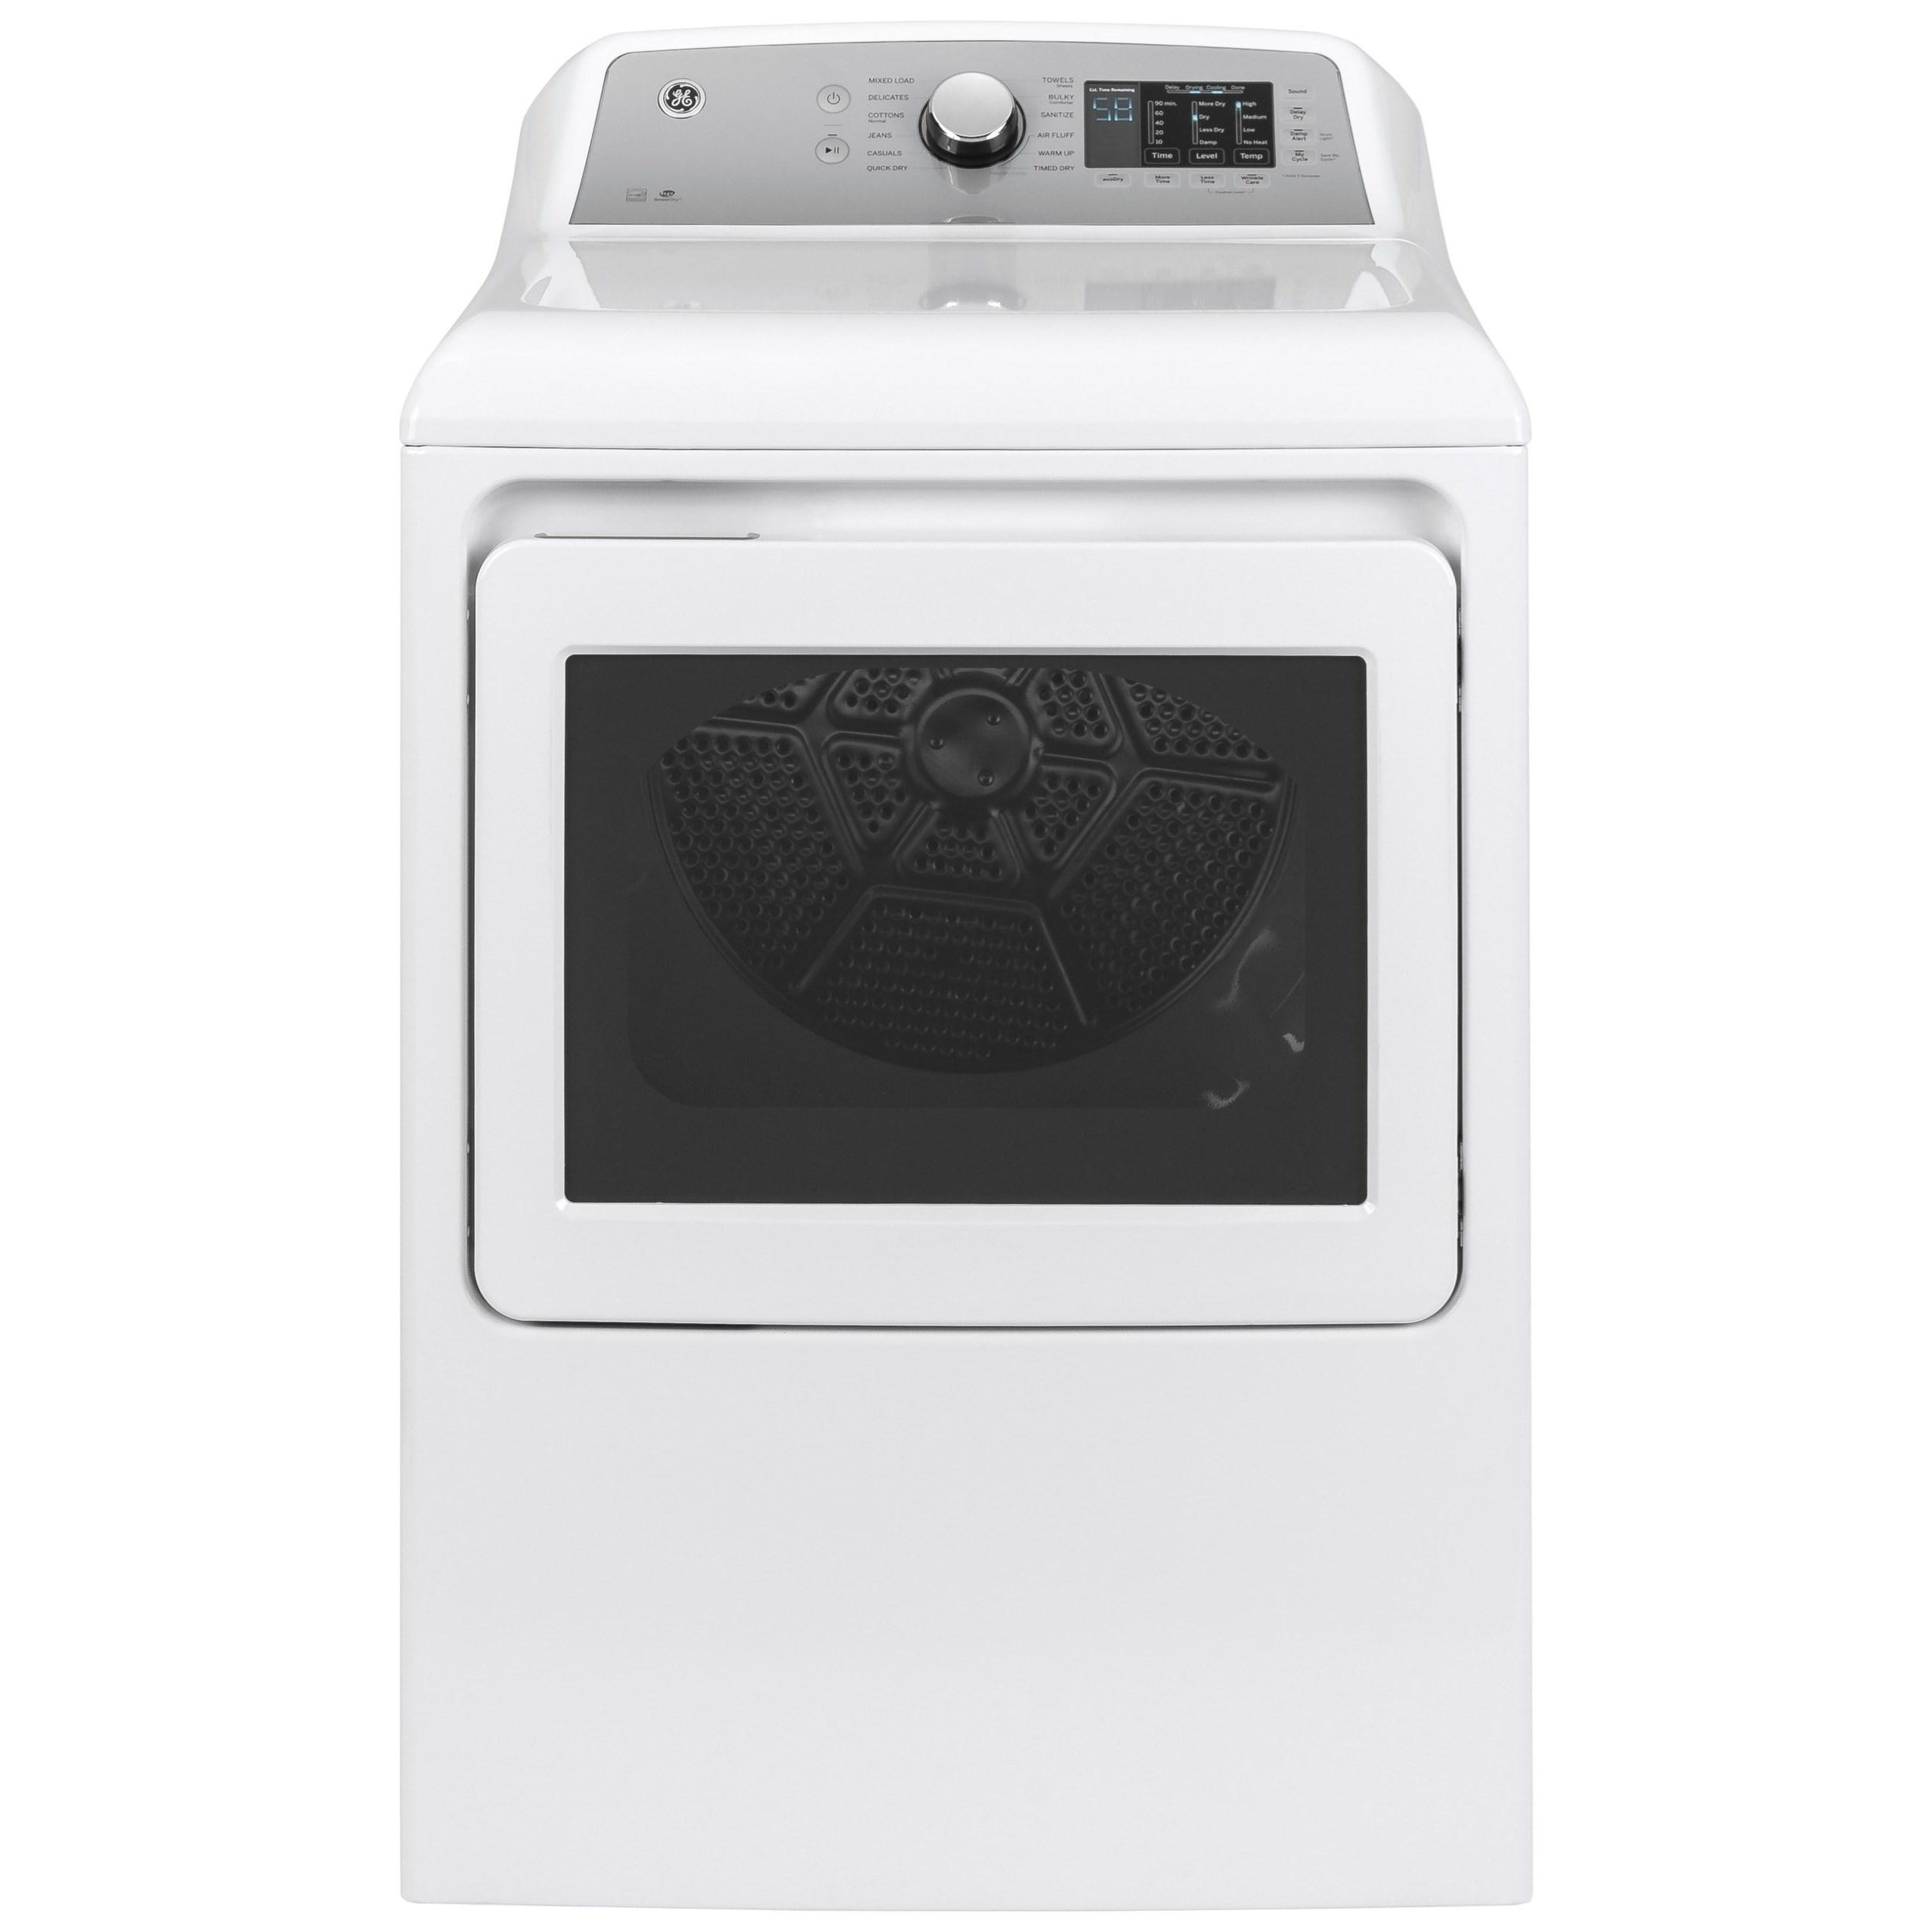 7.4 cu. ft. Capacity Electric Dryer